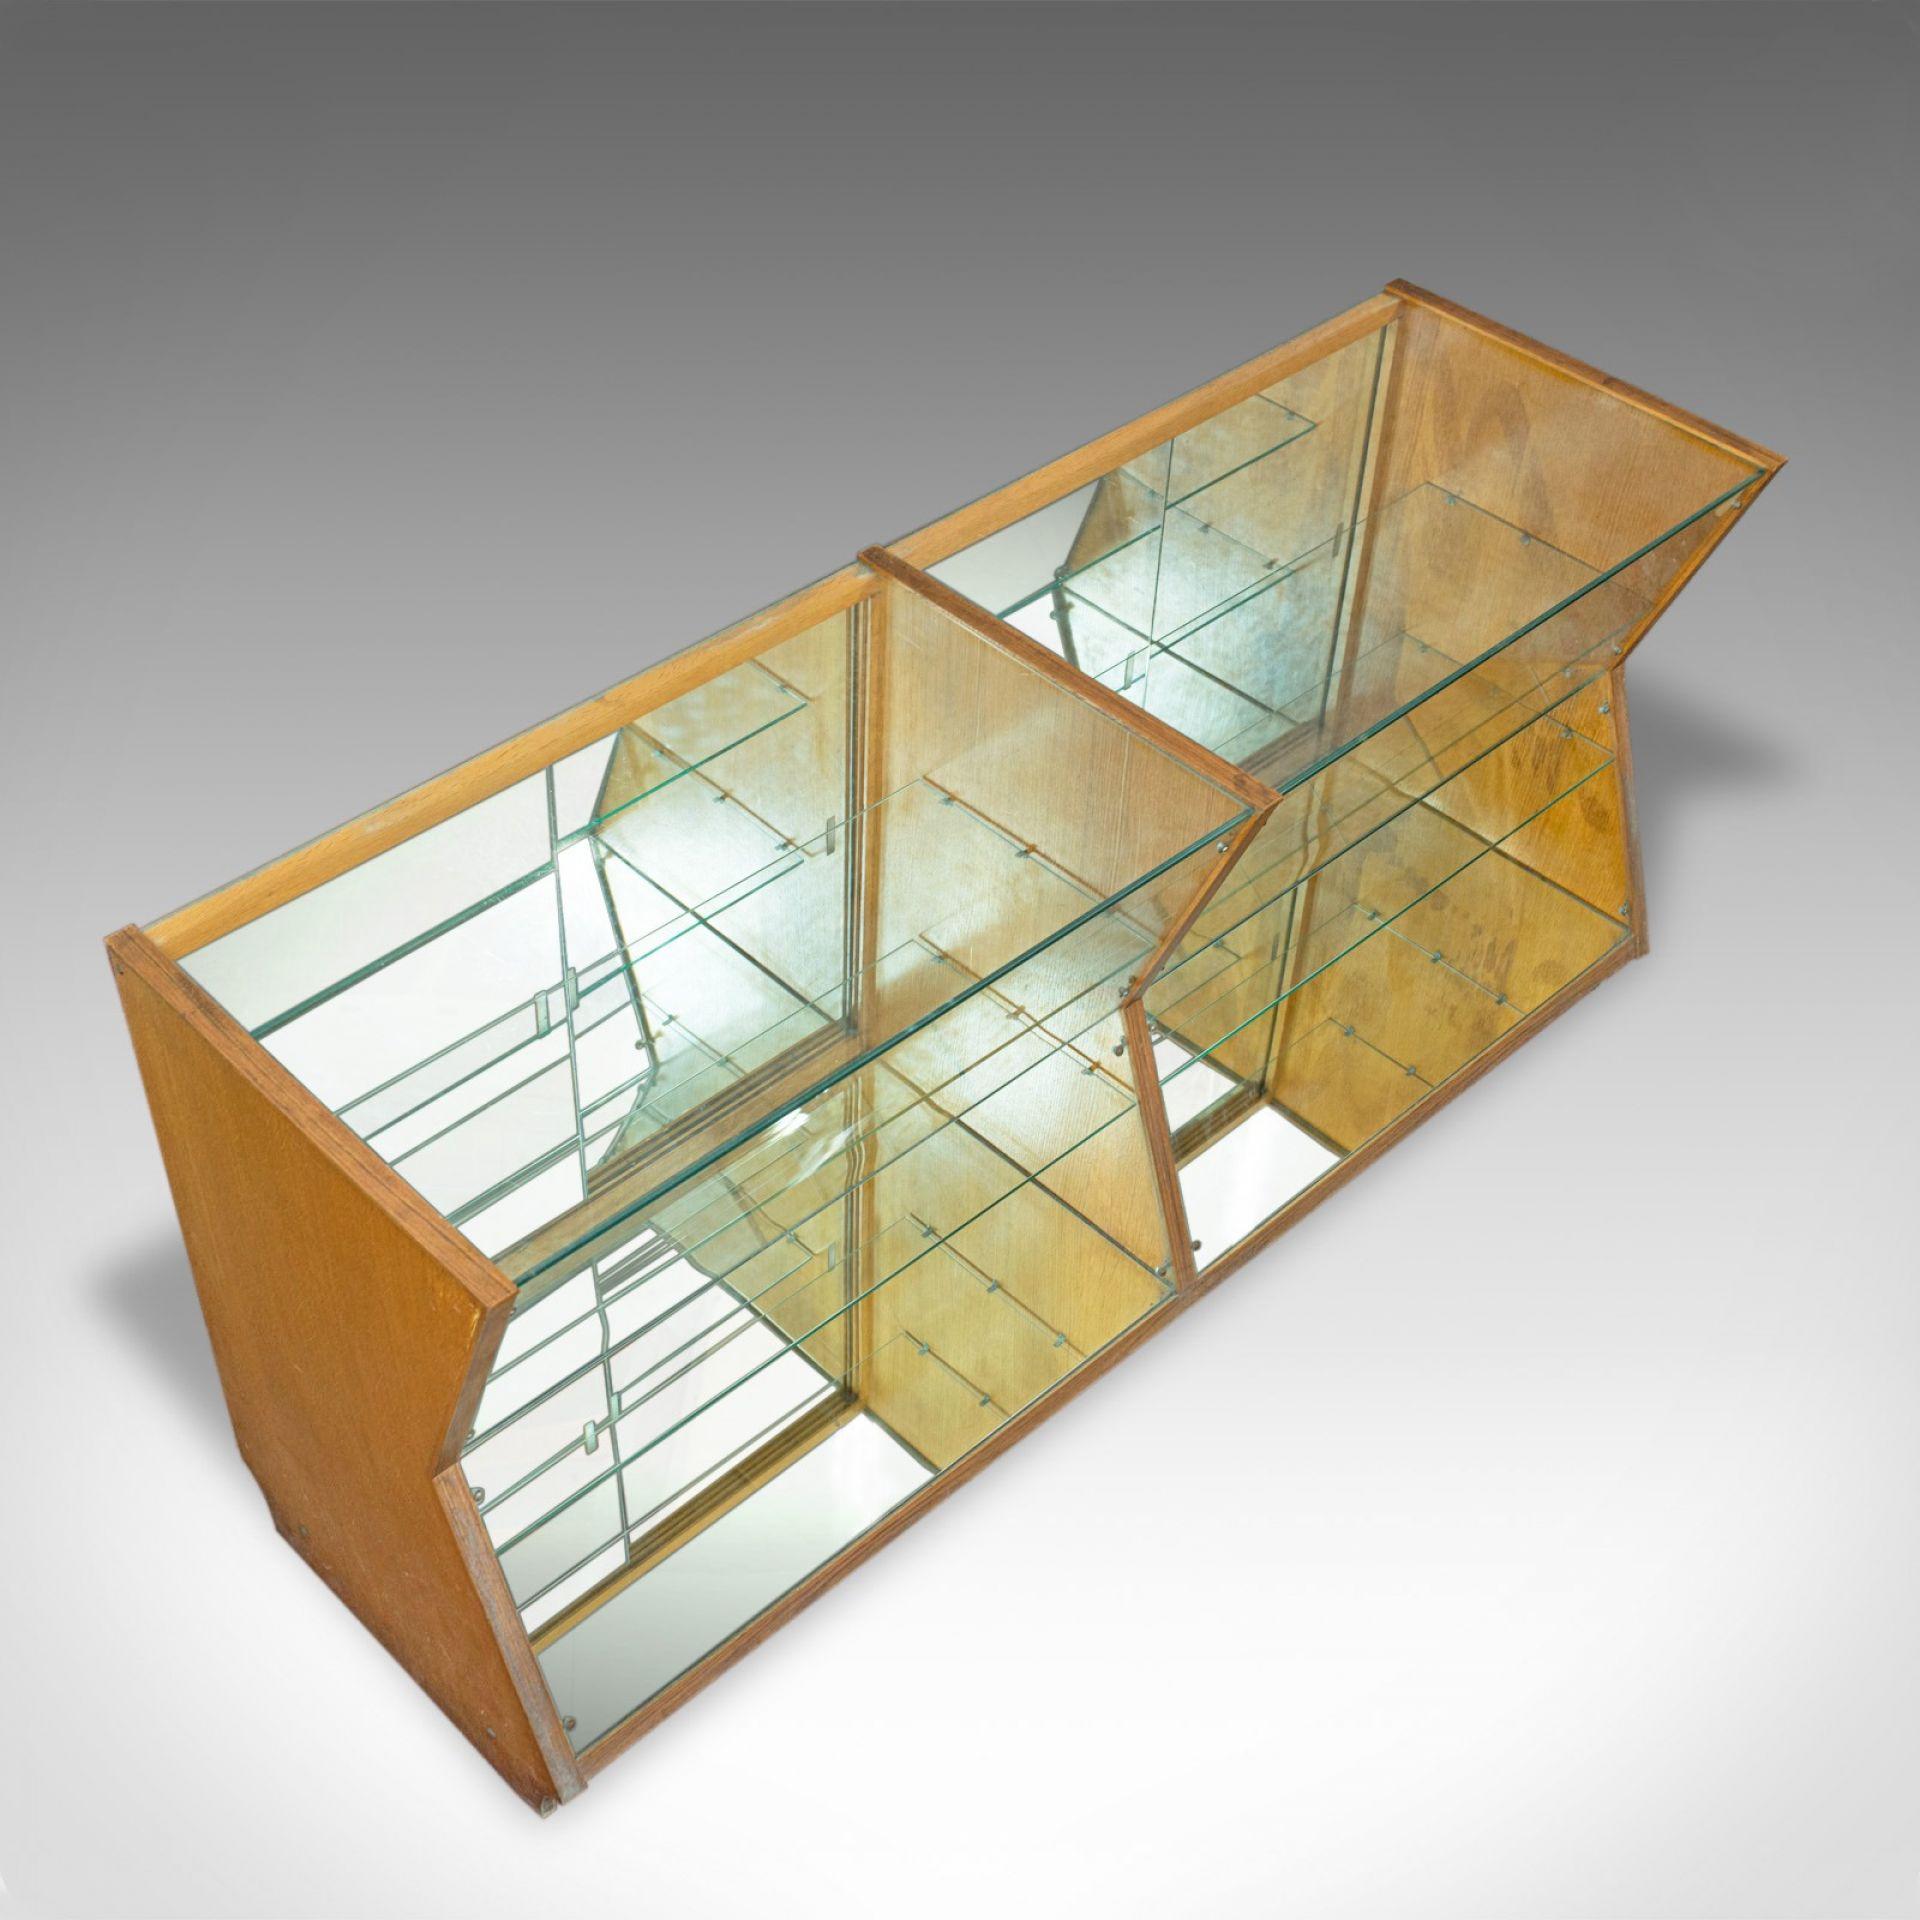 Large Vintage Display Cabinet, Glass, Oak, Retail, Shop-Fitting, Art Deco c.1930